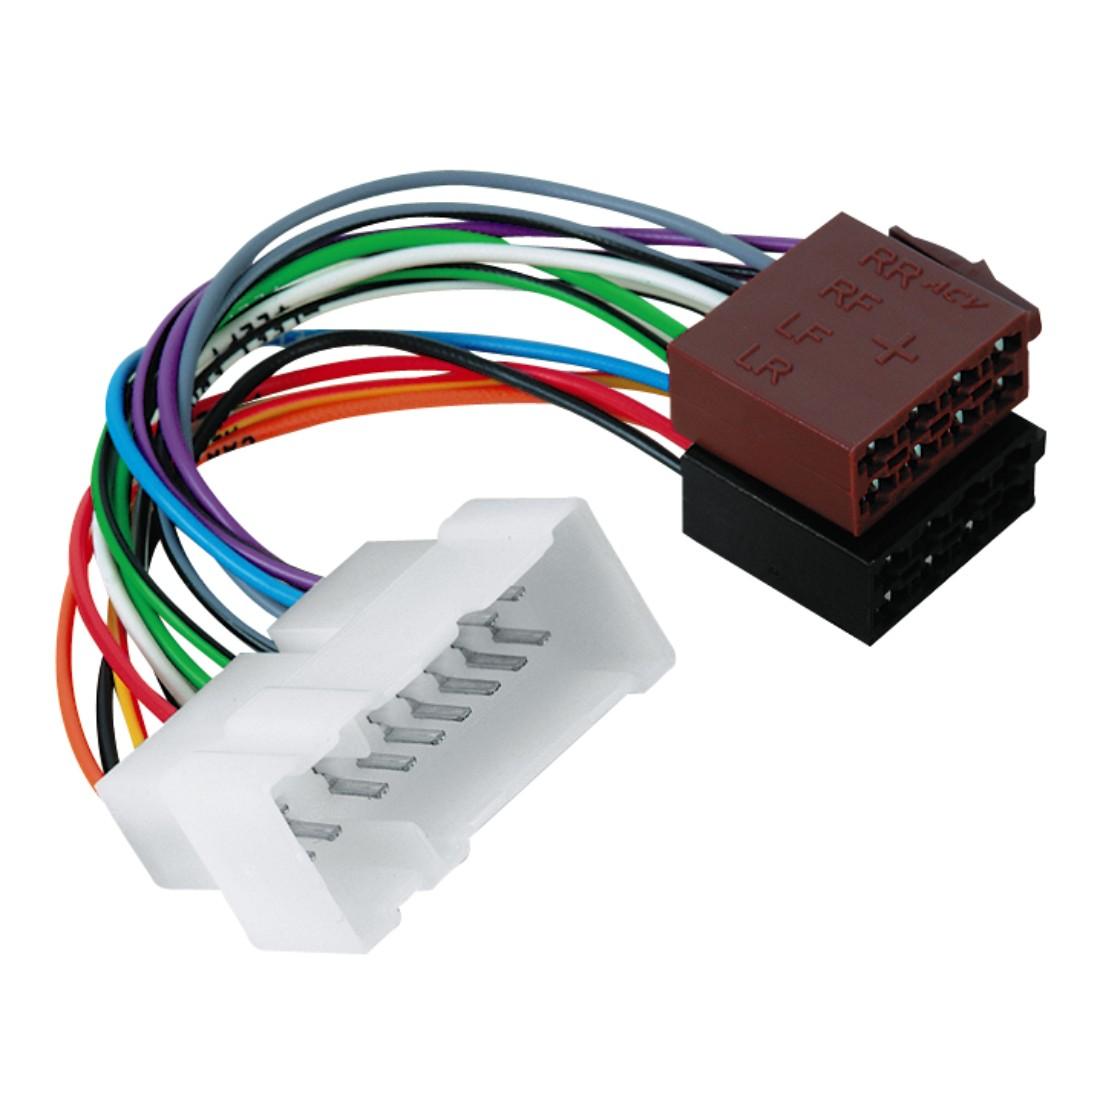 00045757 Hama Kfz-Adapter ISO für Nissan | Hama DE on